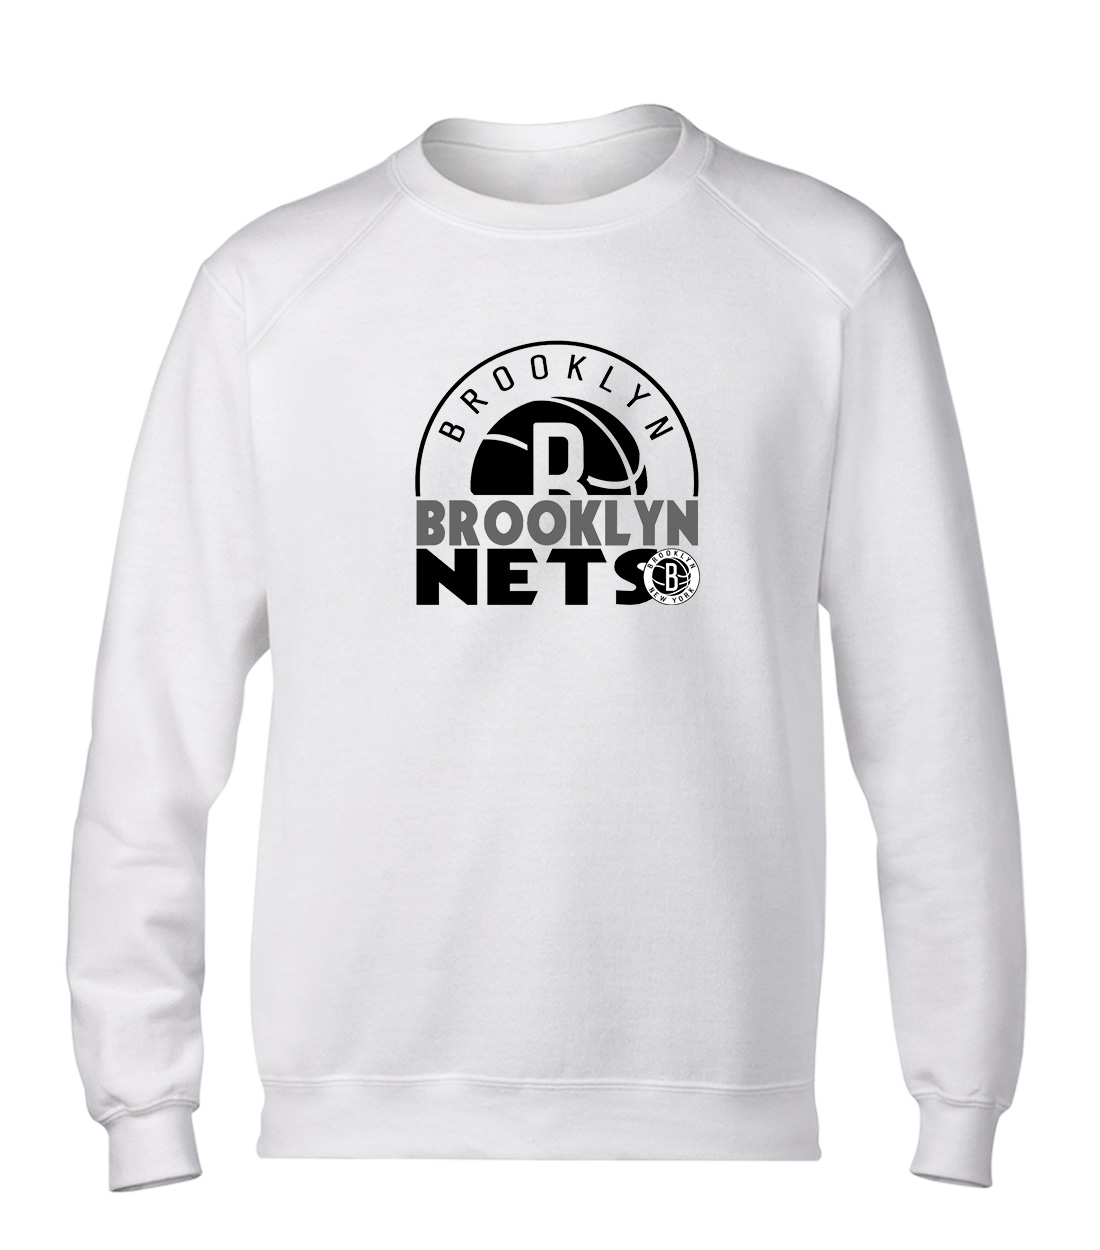 Brooklyn Nets Basic (BSC-WHT-NP-357-NBA-Brklyn.Nets)